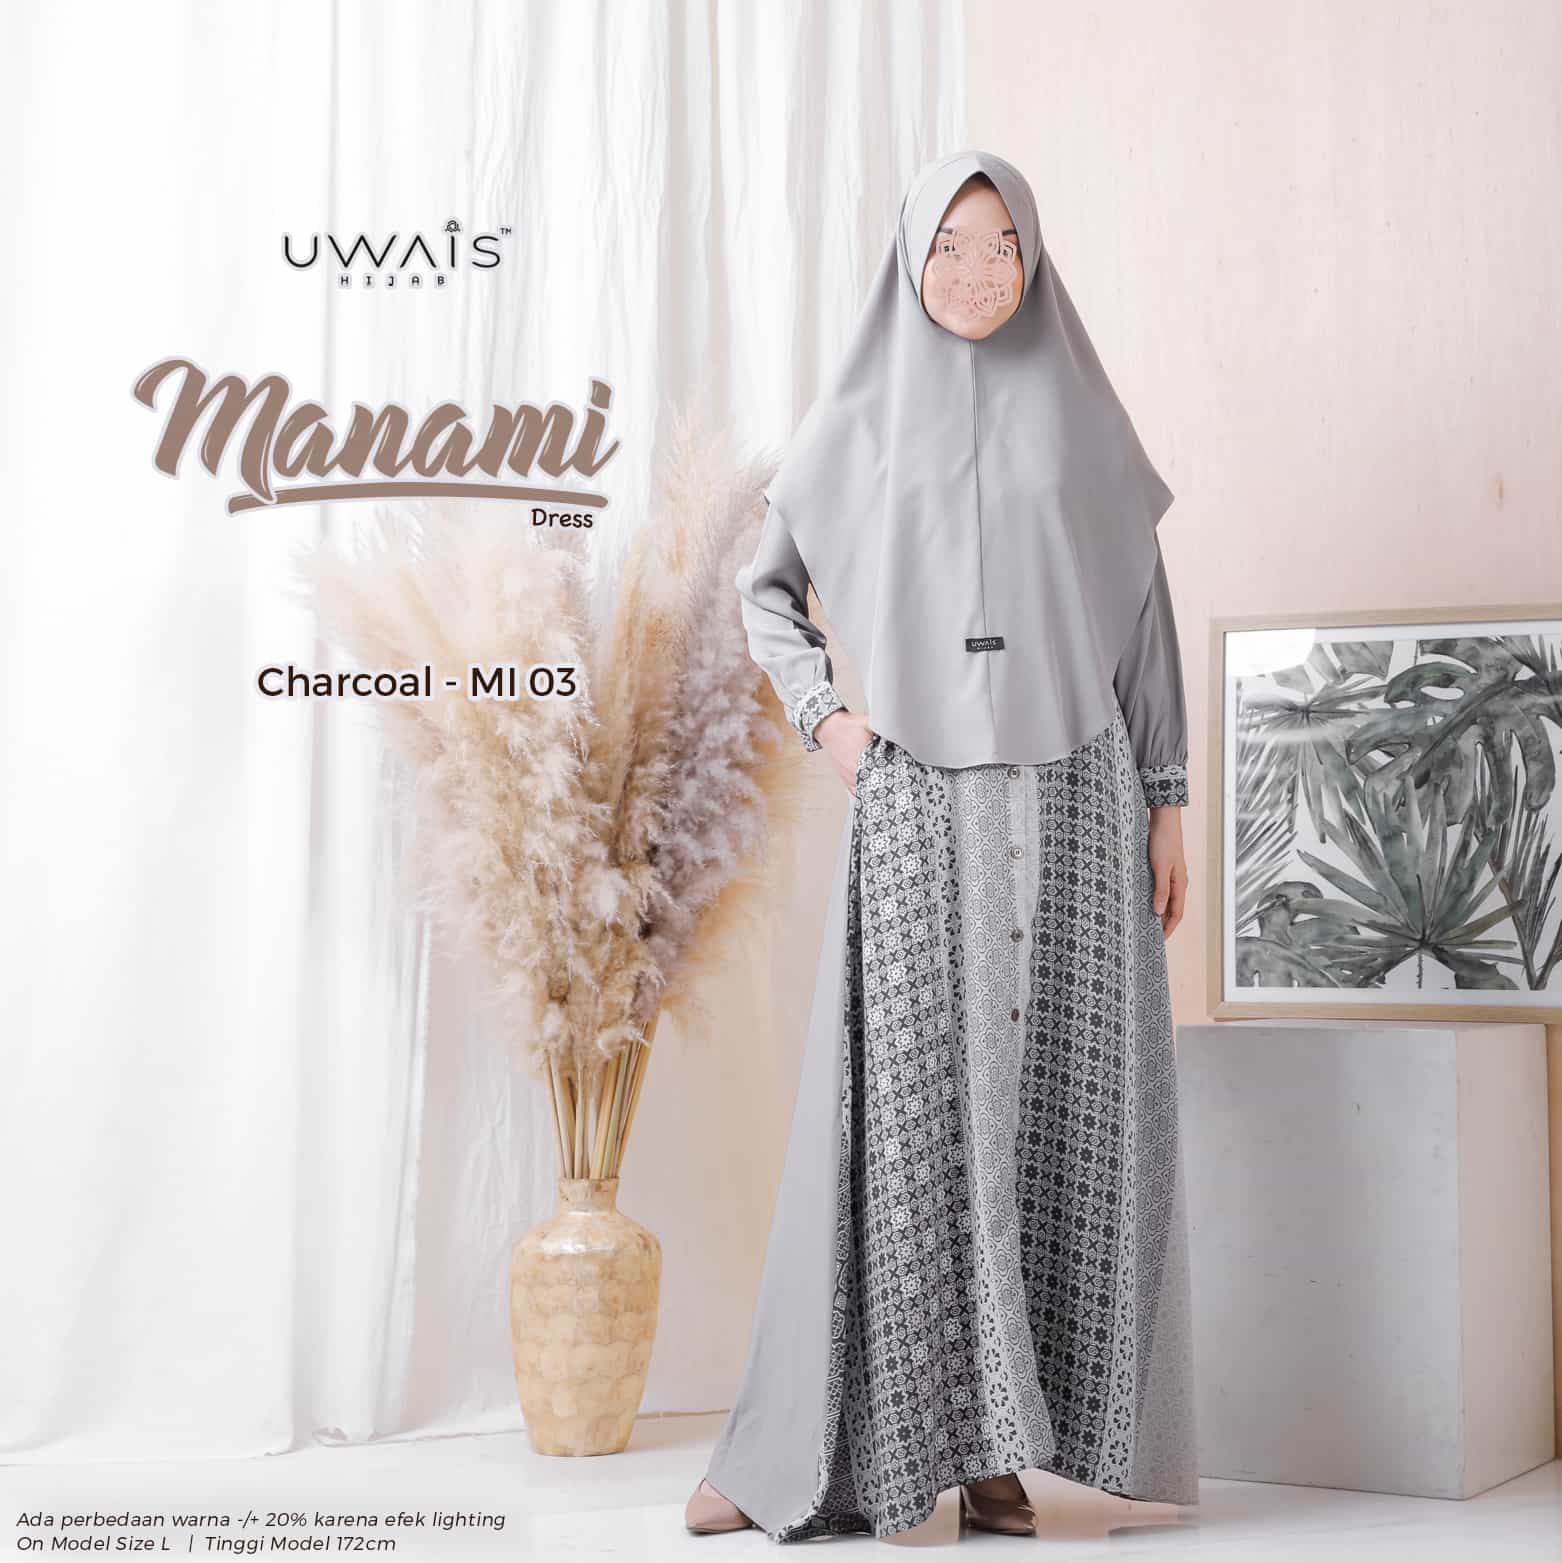 nanami_dress_charcoa_YUhbd